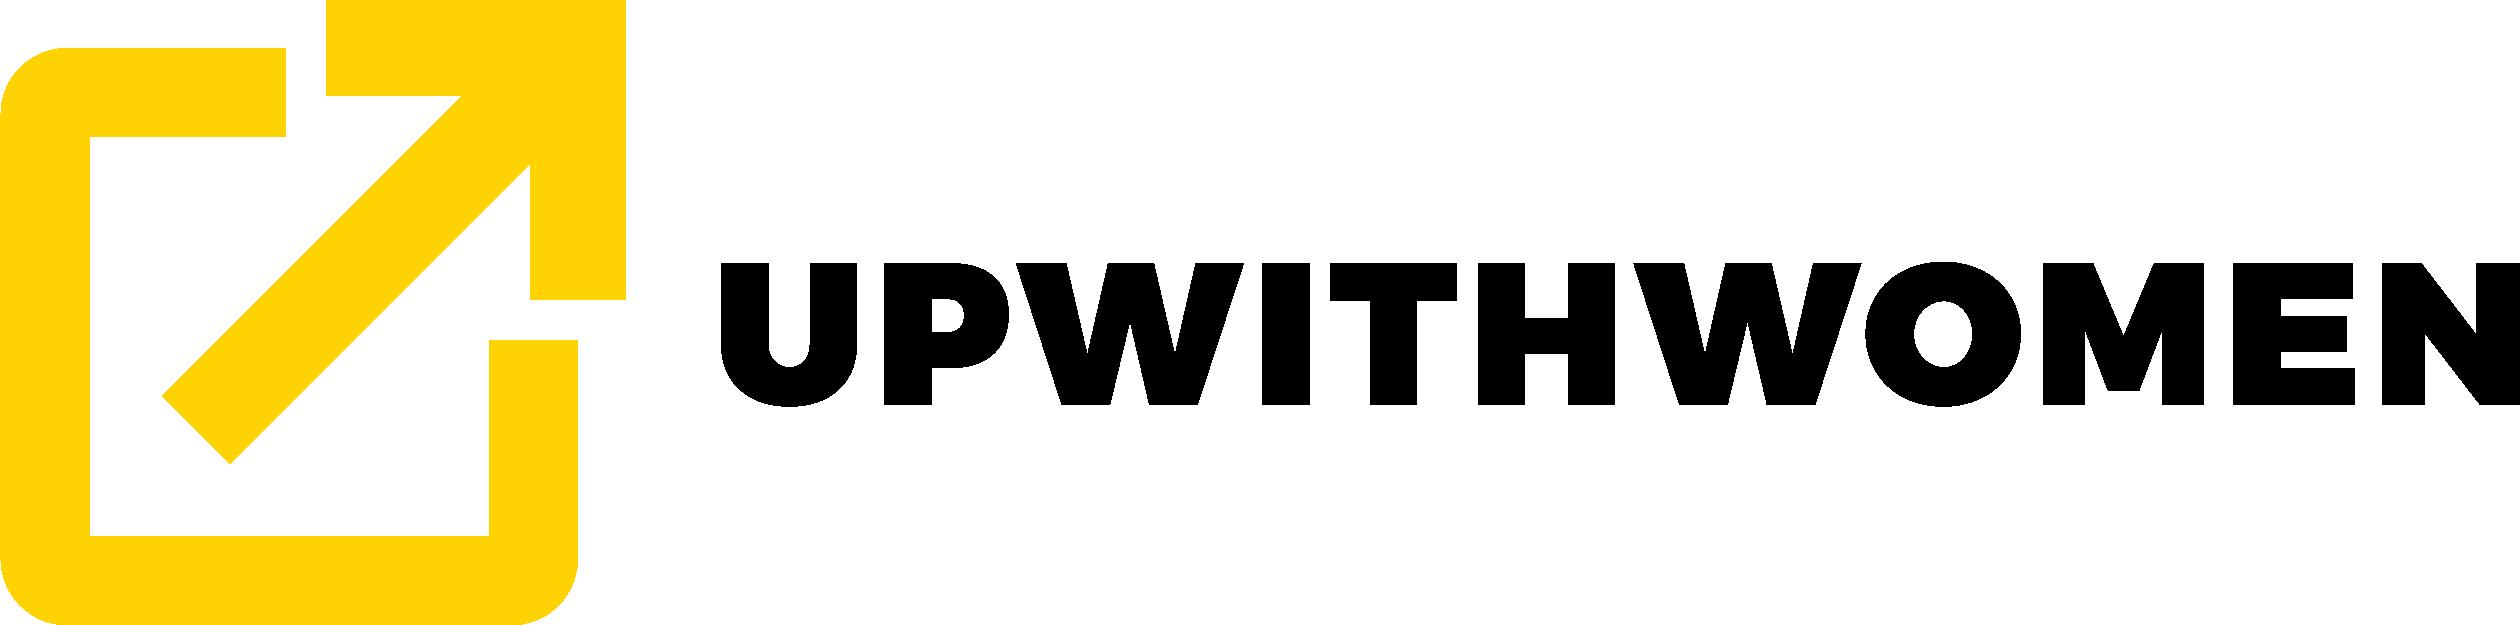 Horizontal_116 + Blk